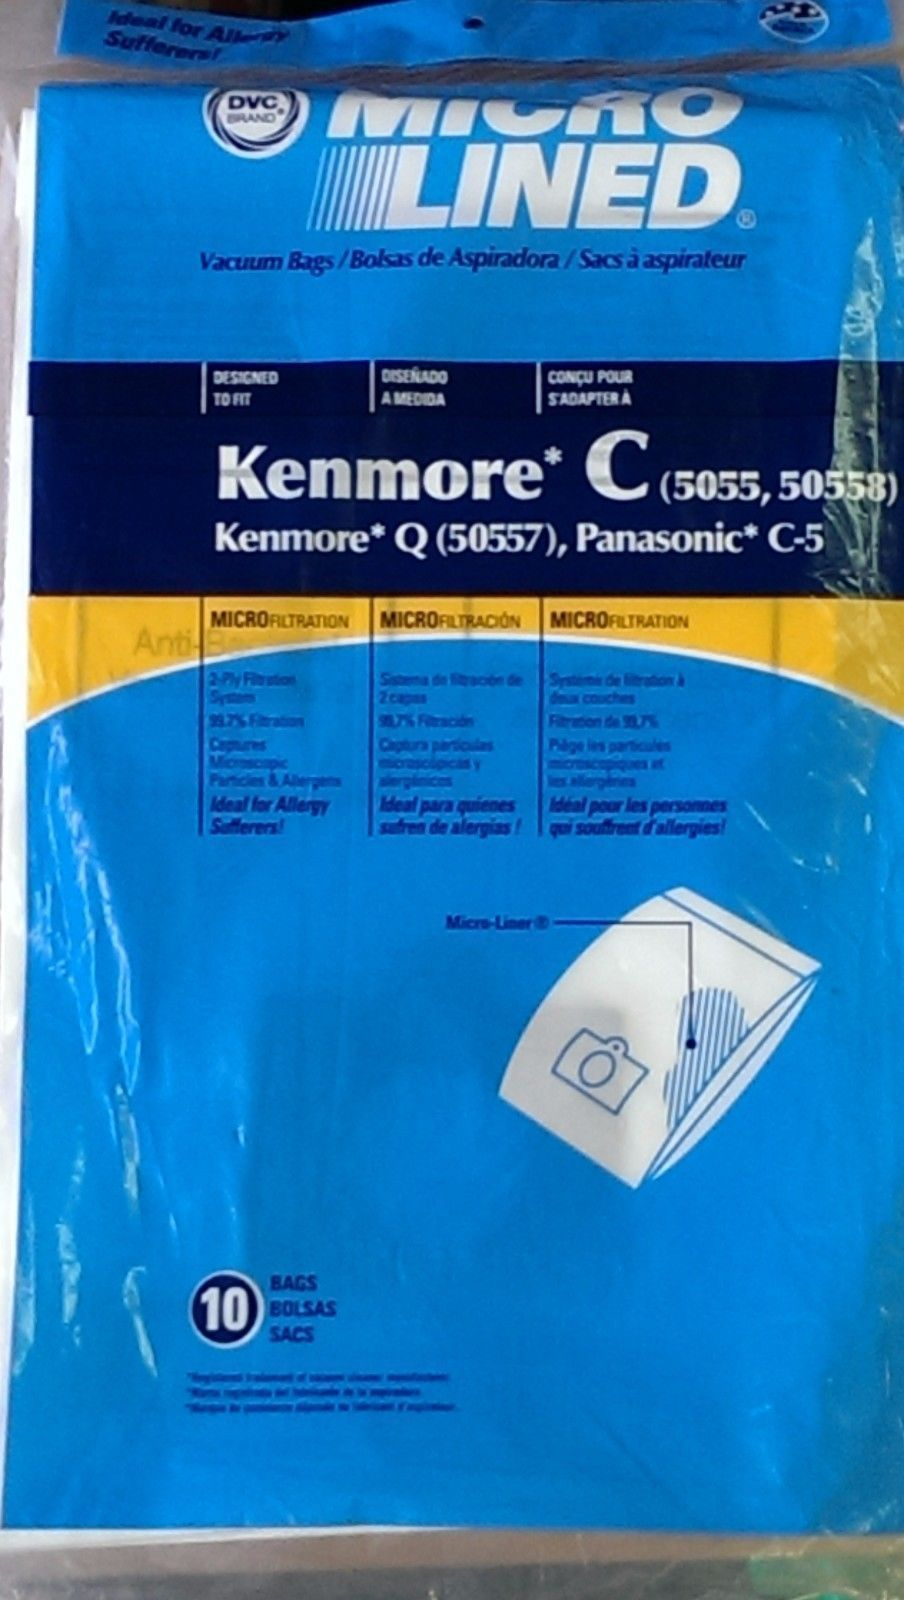 Numatic Aspirapolvere Tubo Flessibile 2.5m e Tool Kit con 20 x sacchetti di carta